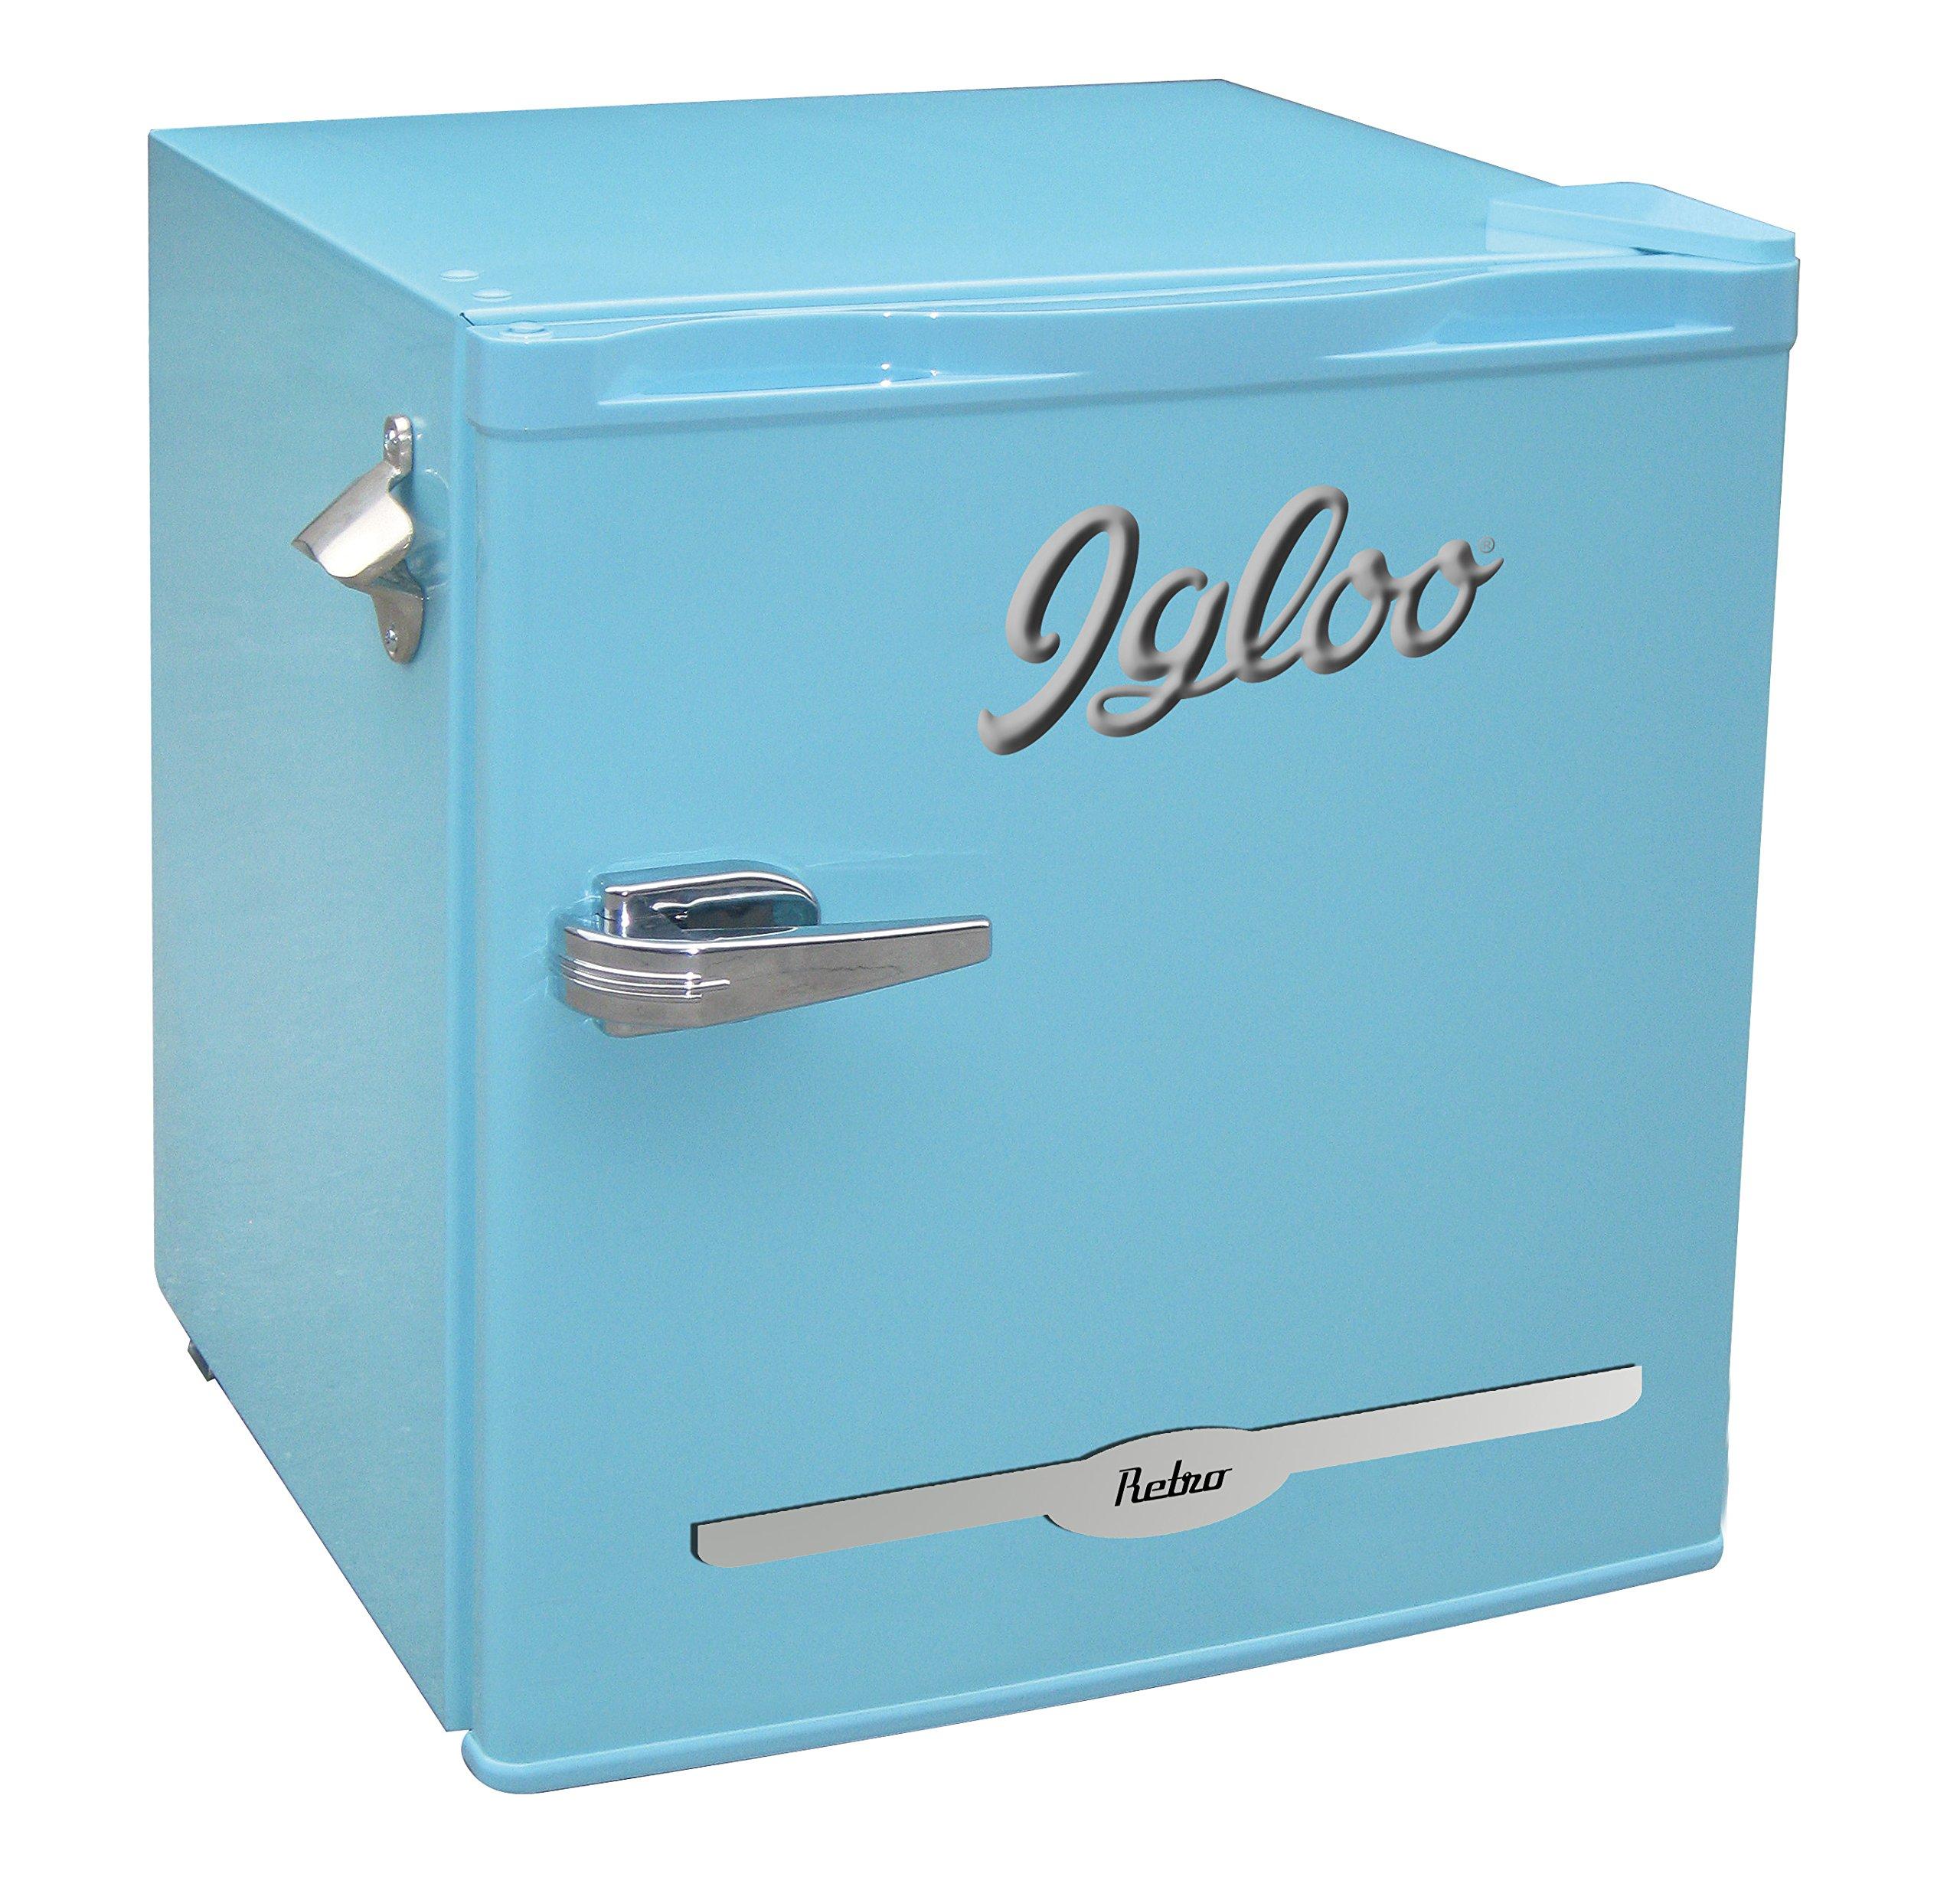 Igloo FR176-BLUE 1.6 cu. ft. Retro Bar Fridge with Side Bottle Opener, Blue